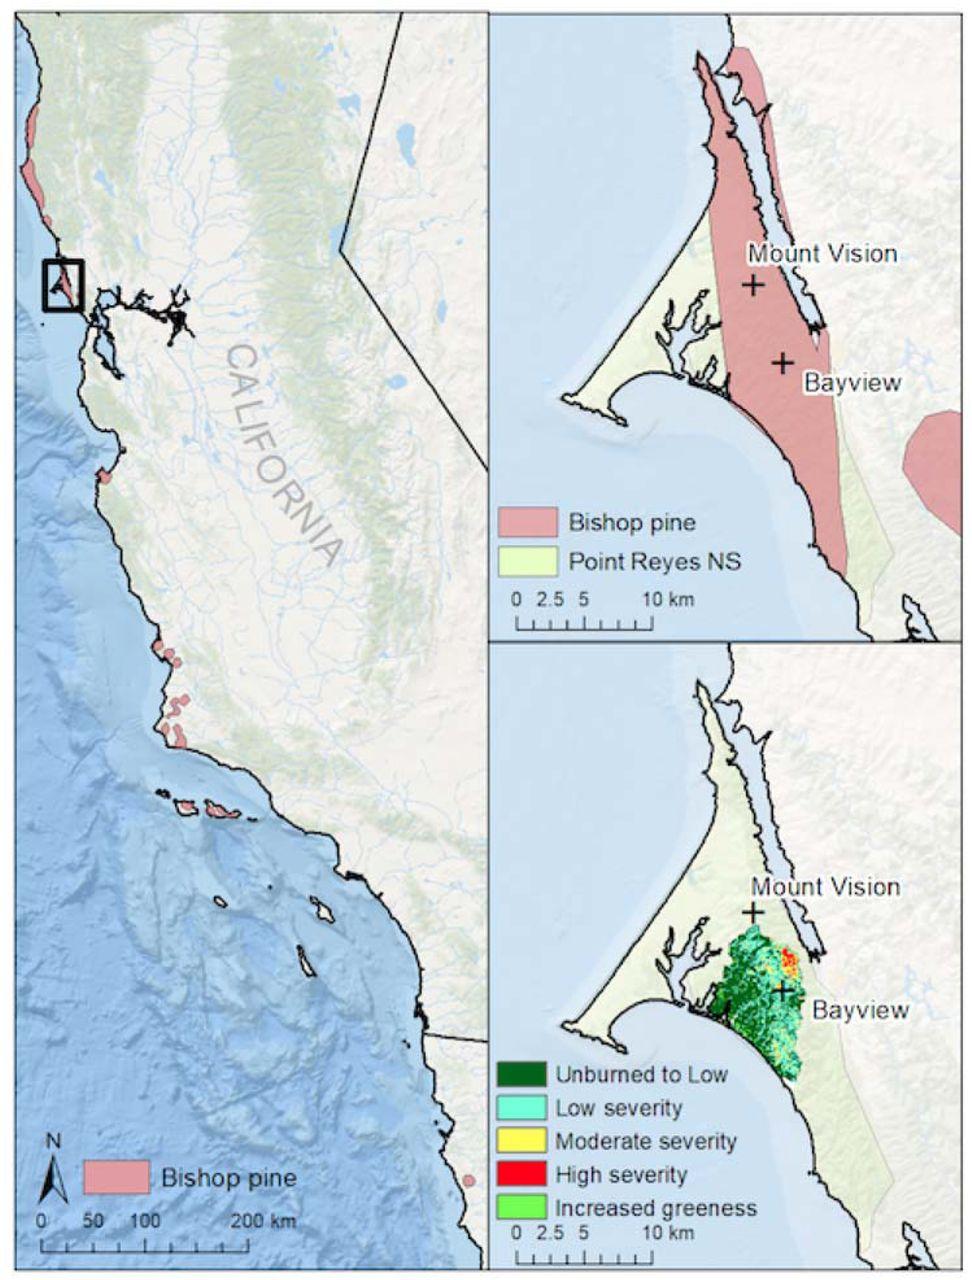 Disturbance macroecology: integrating disturbance ecology